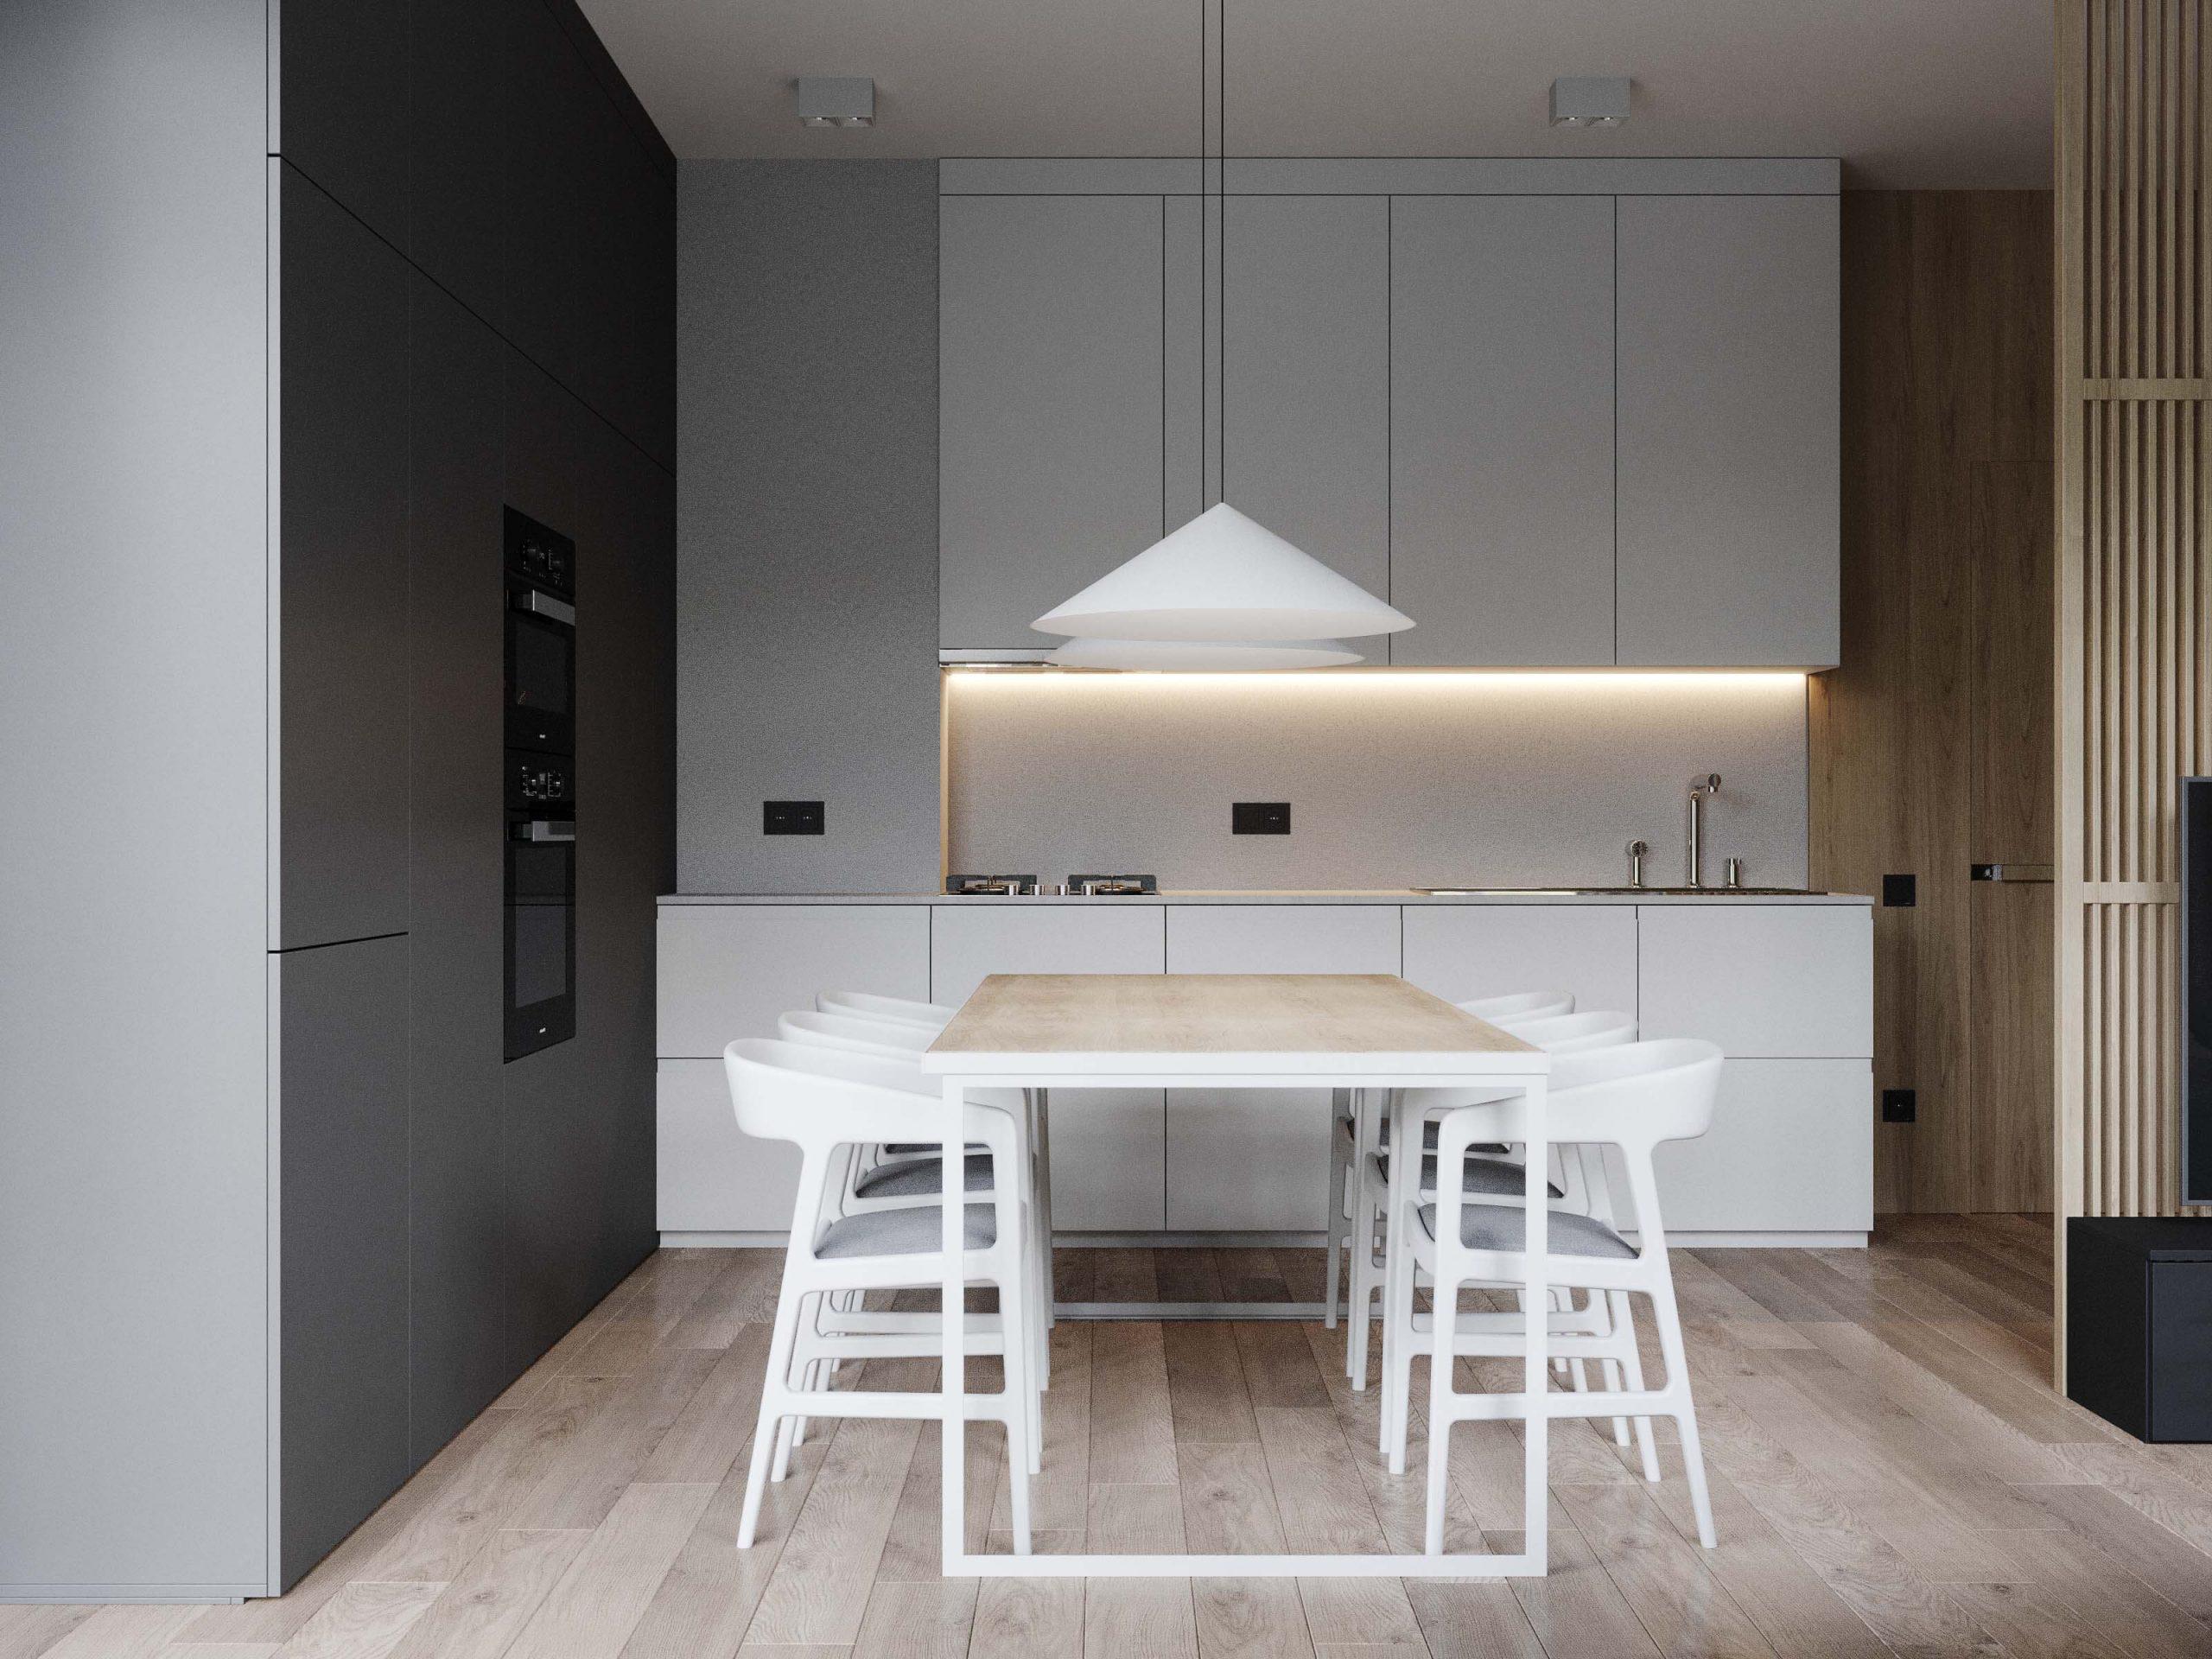 minimalist style kitchen interior design